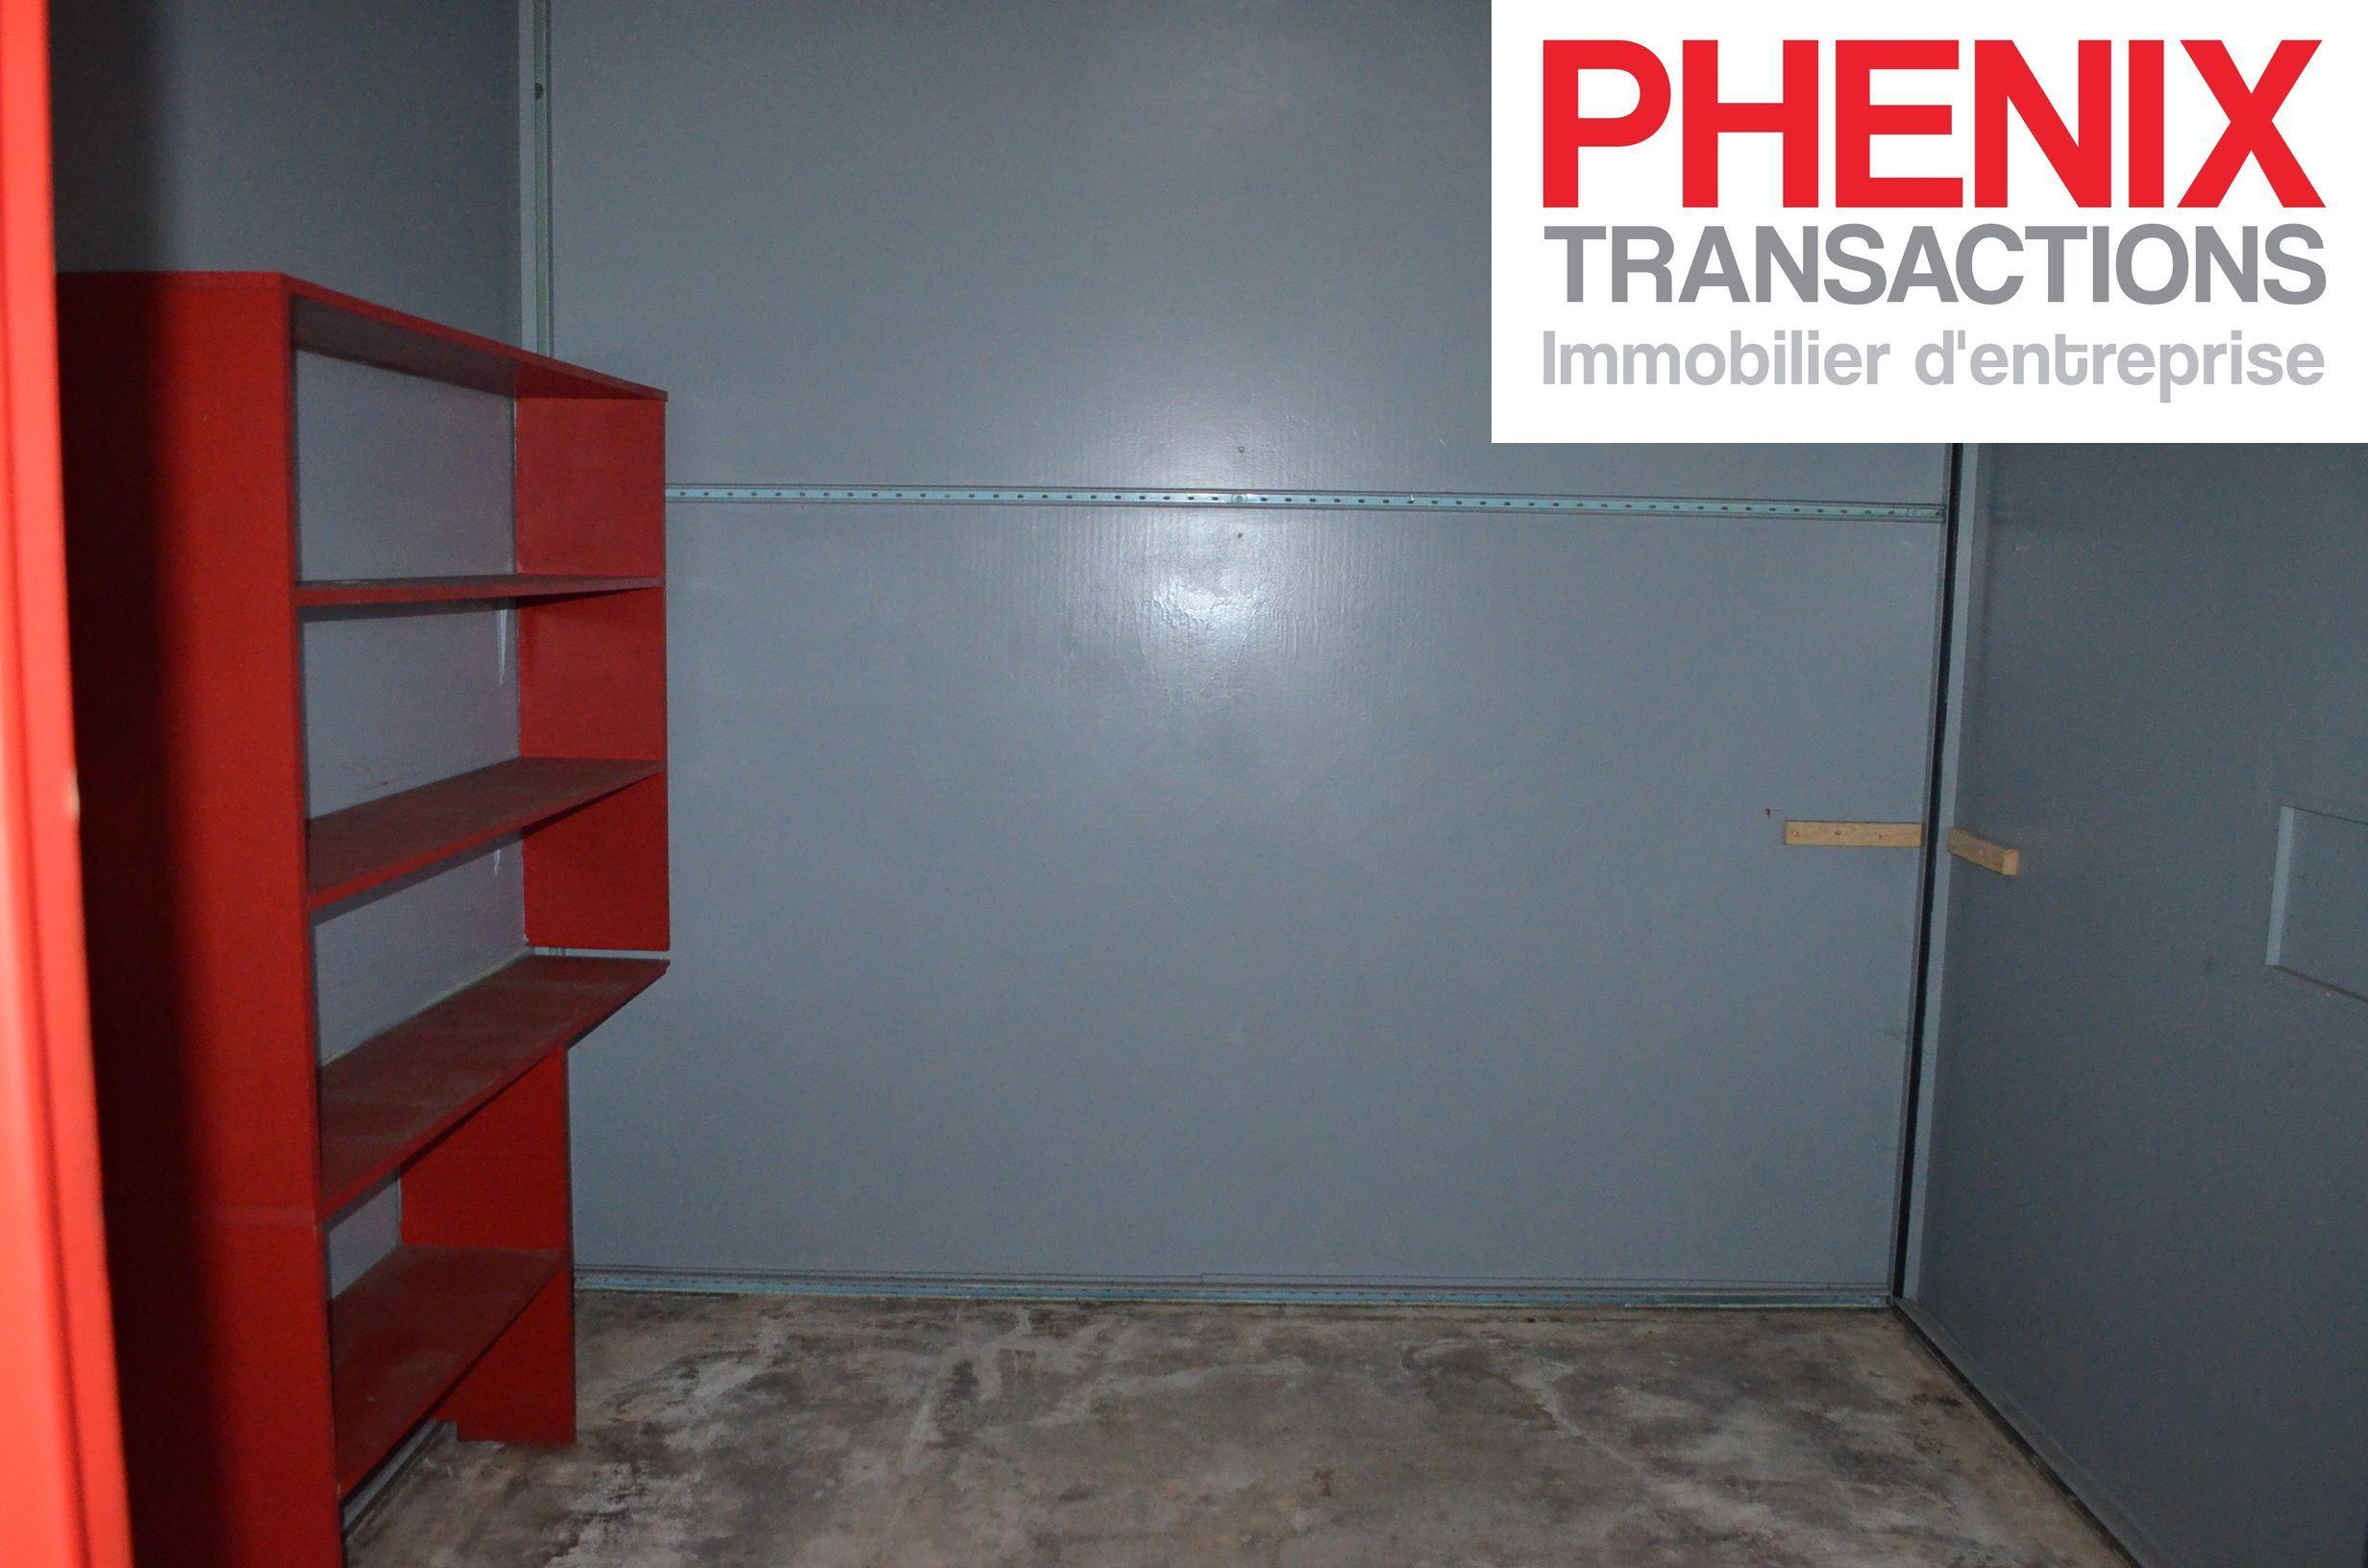 LOCAL DACTIVIT PONT LABB Phenix Transactions